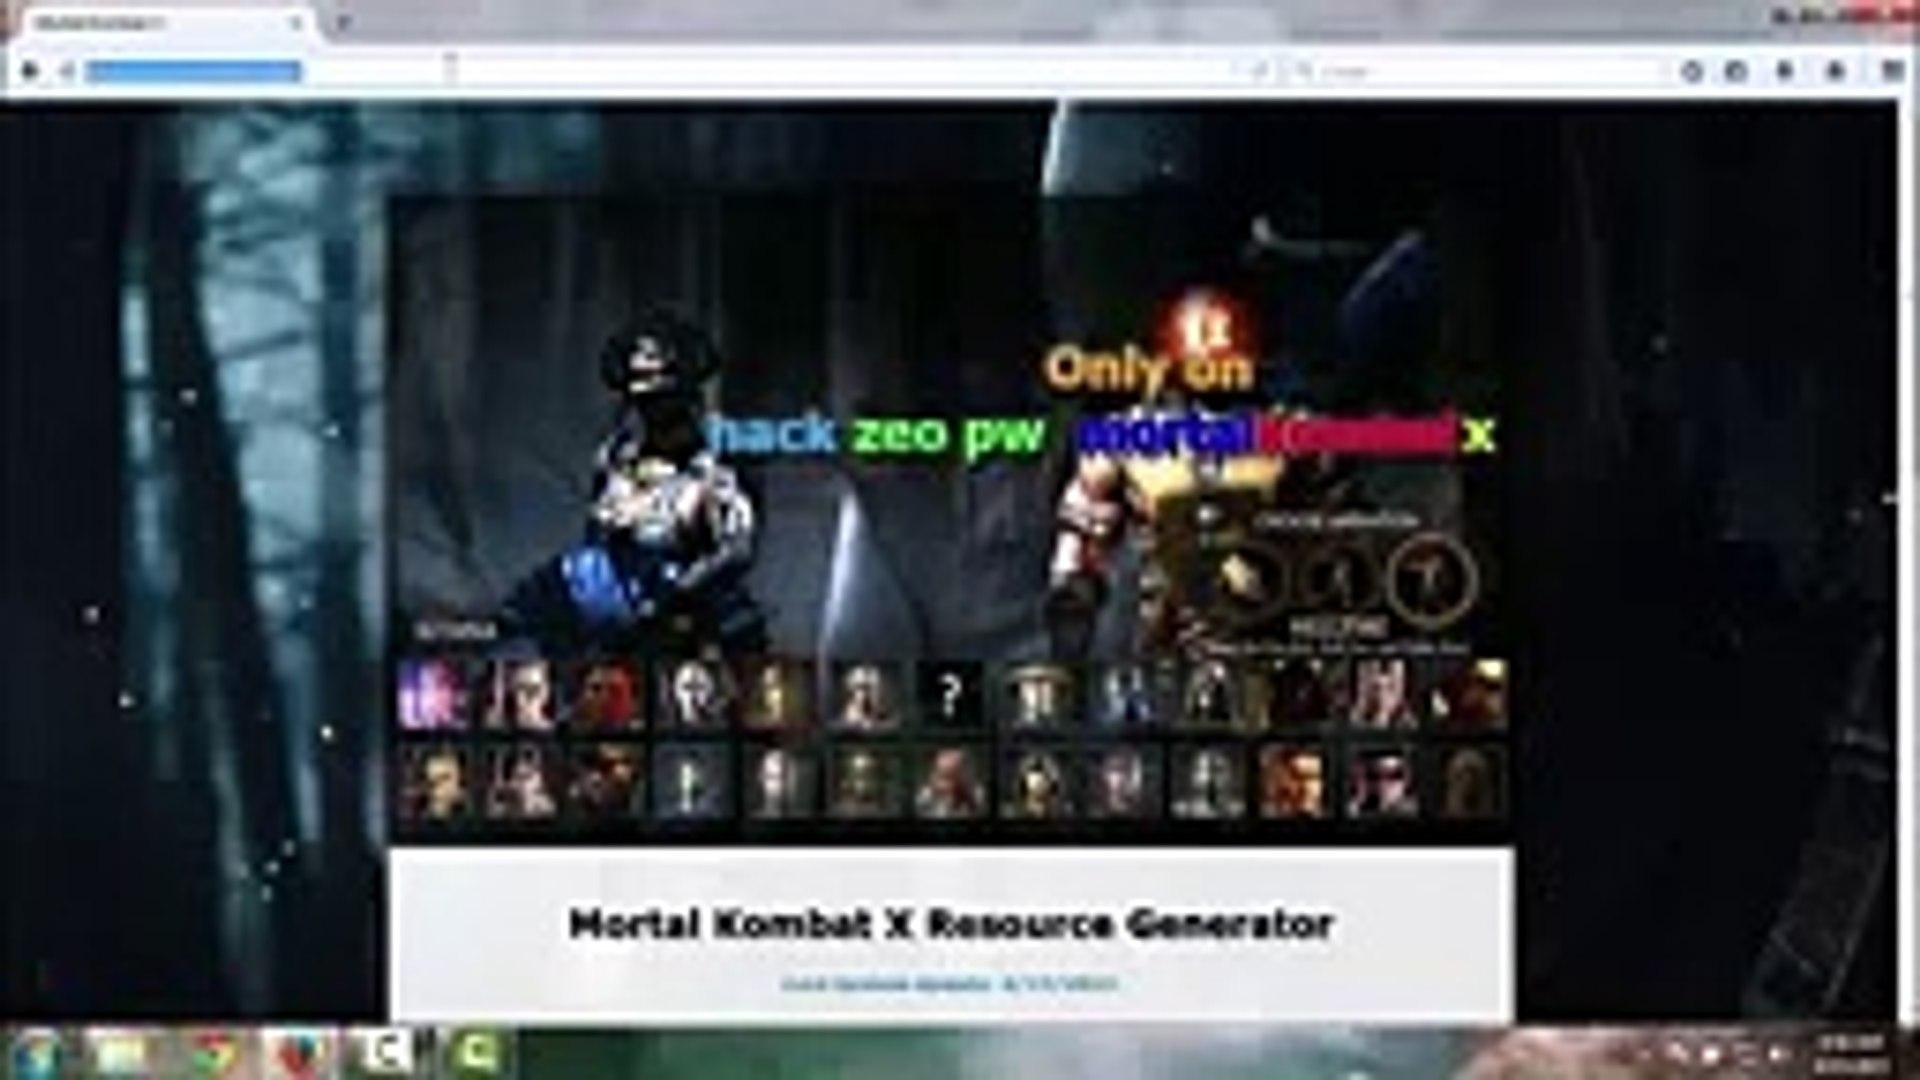 Mortal Kombat X Hack - Tutorial and Mortal Kombat X Cheats